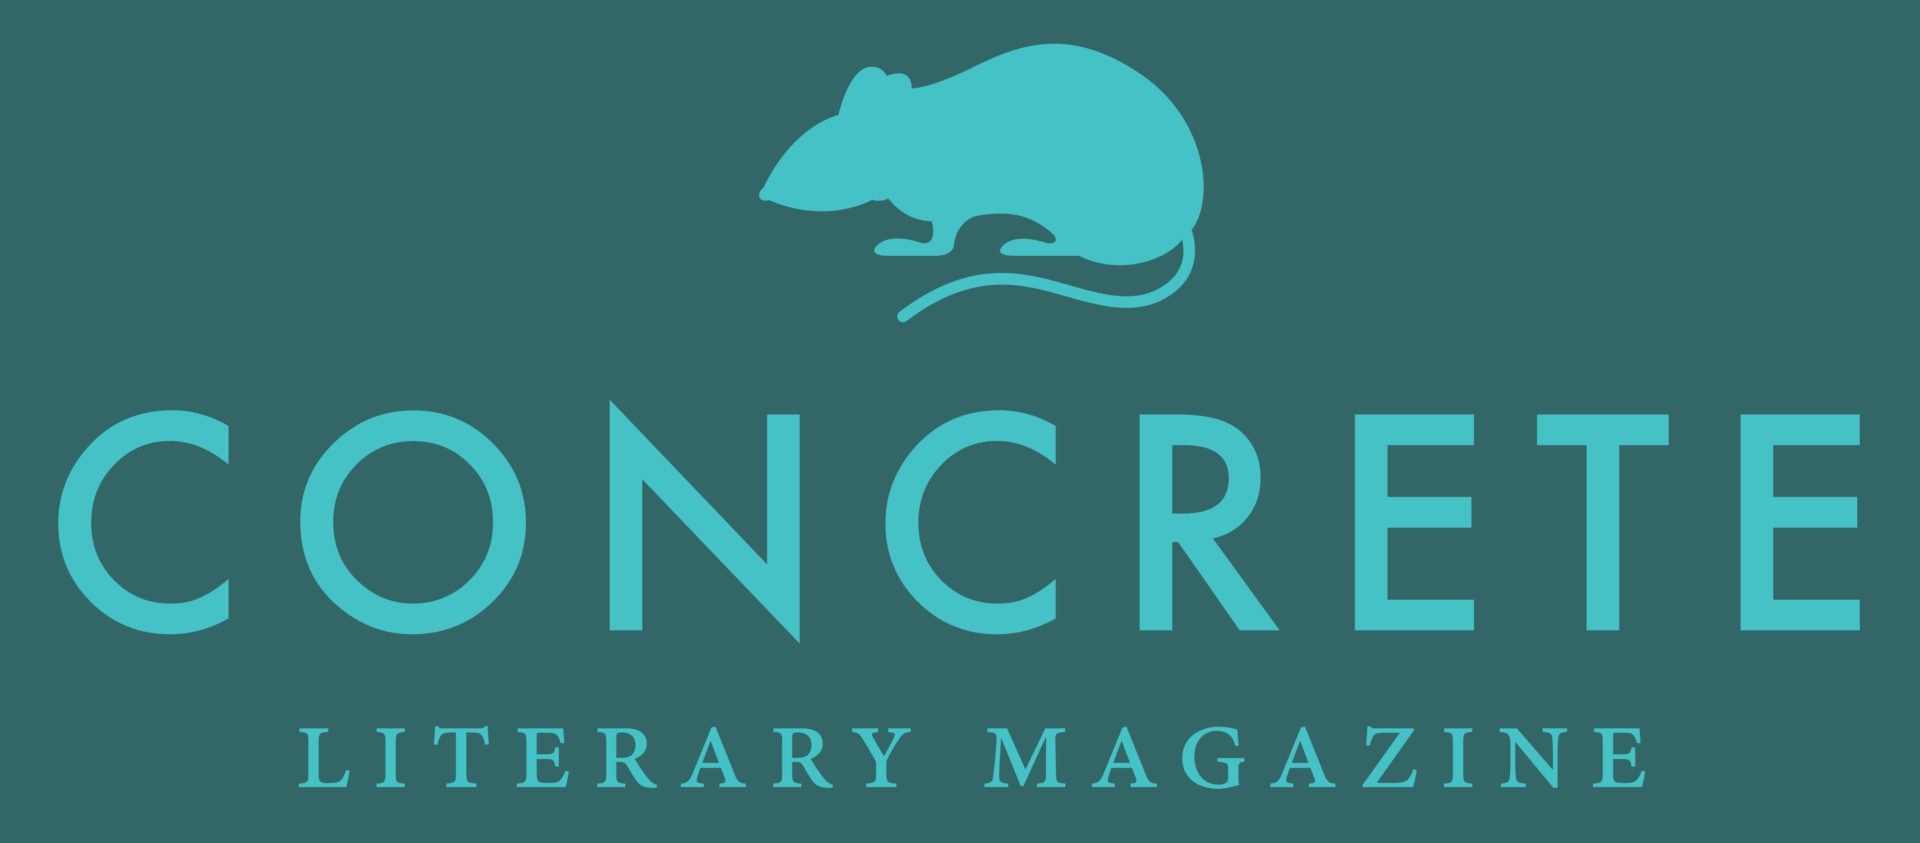 Concrete Literary Magazine